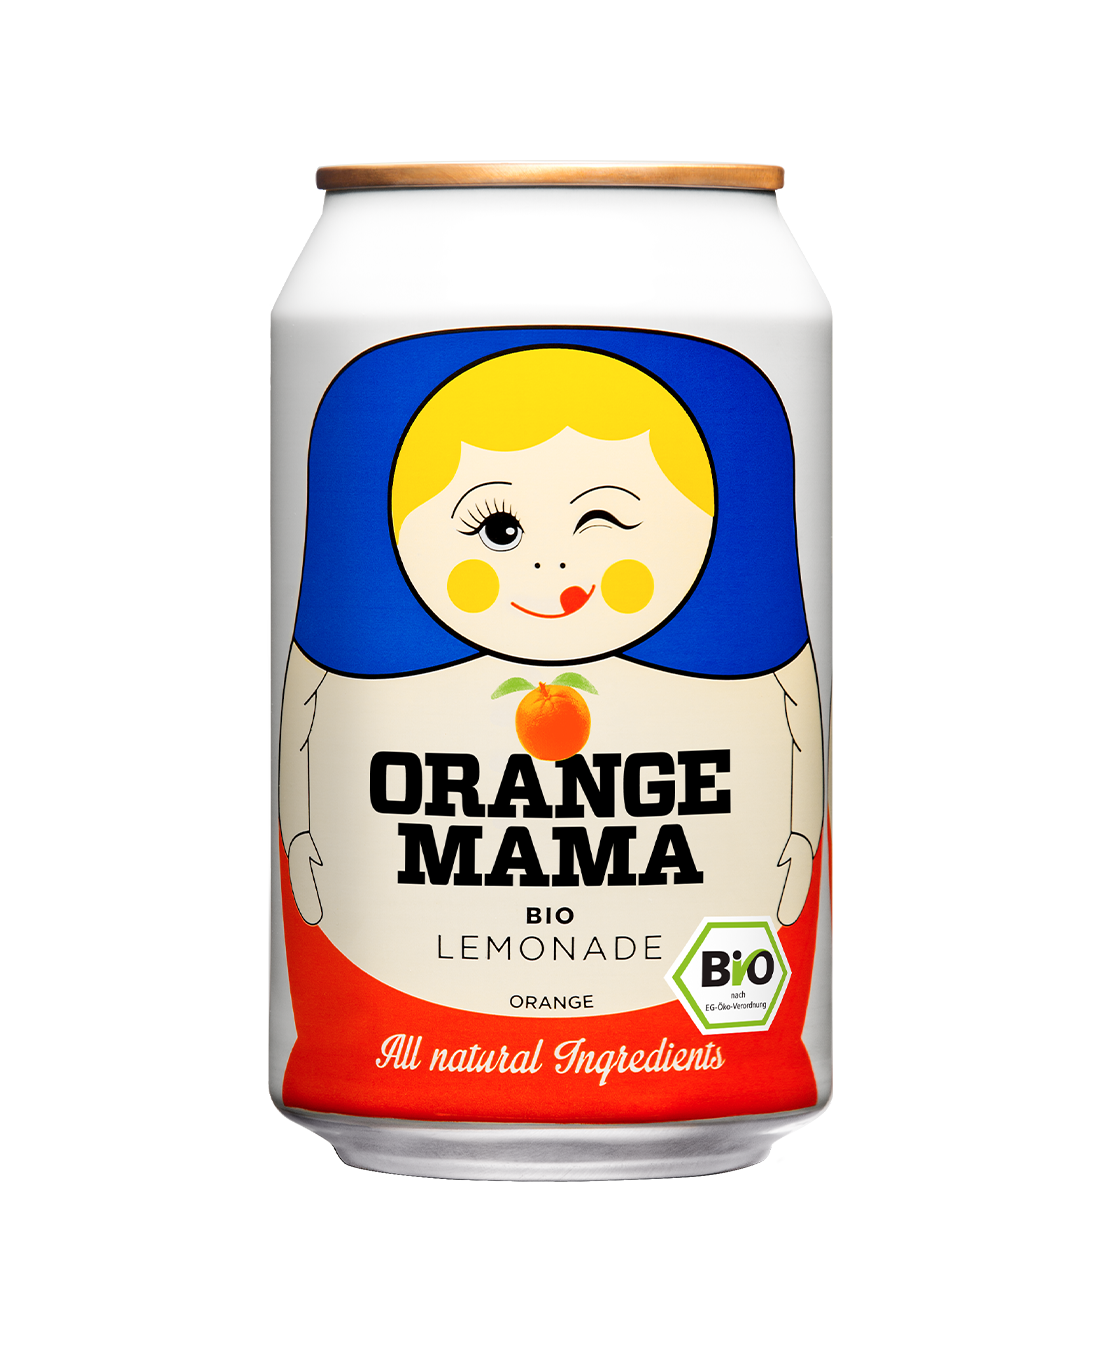 Orange Mama Lemonade